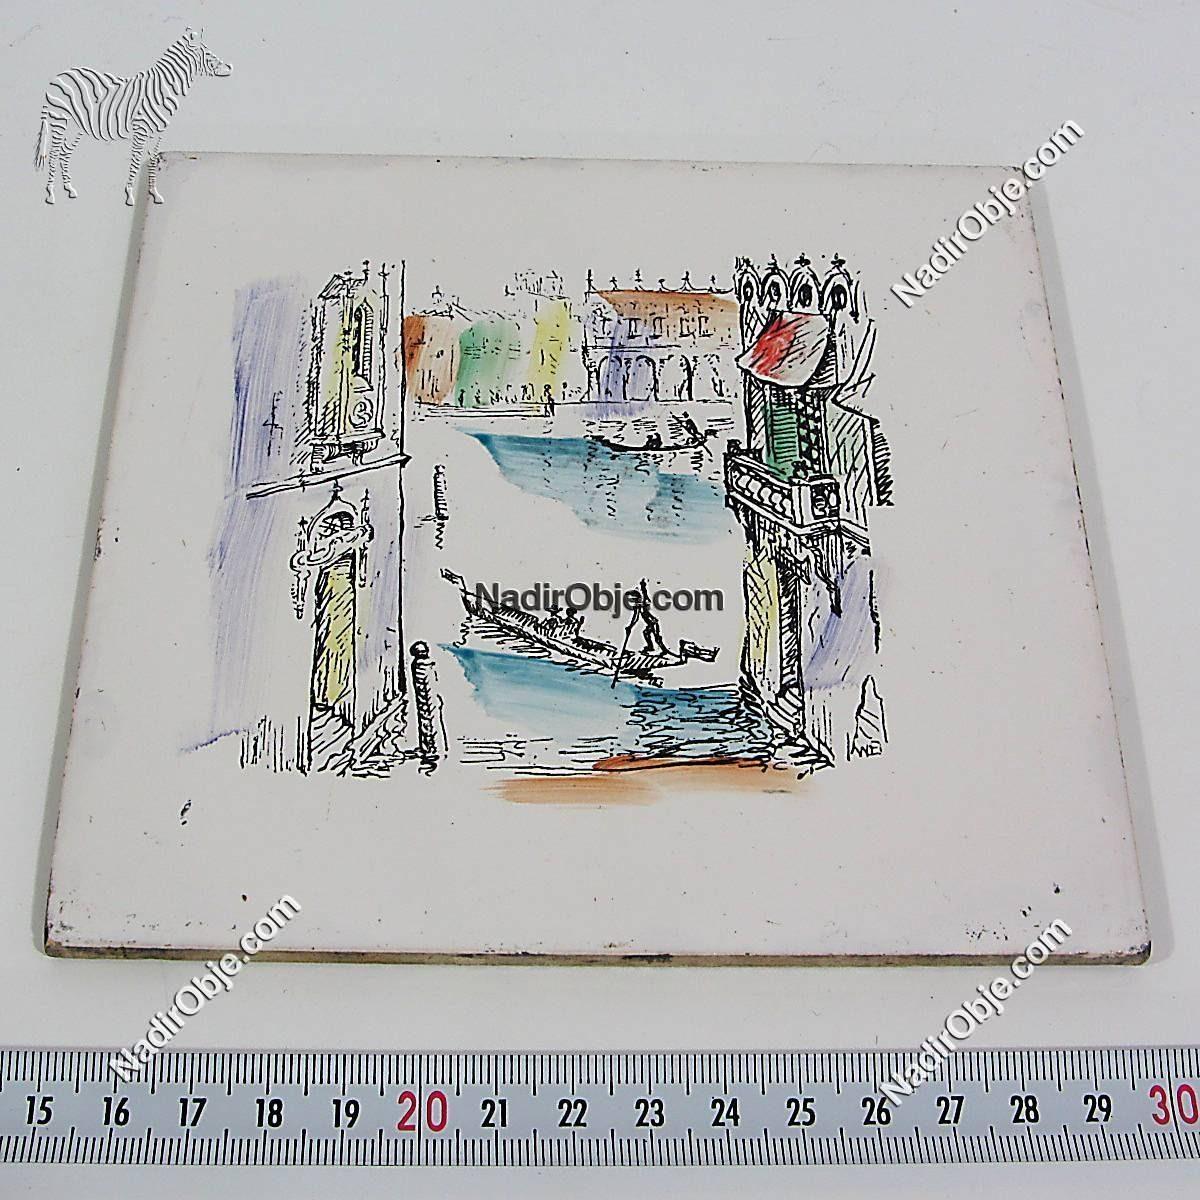 Seramik Fayans Levha Seramik-Porselen Objeler Fayans